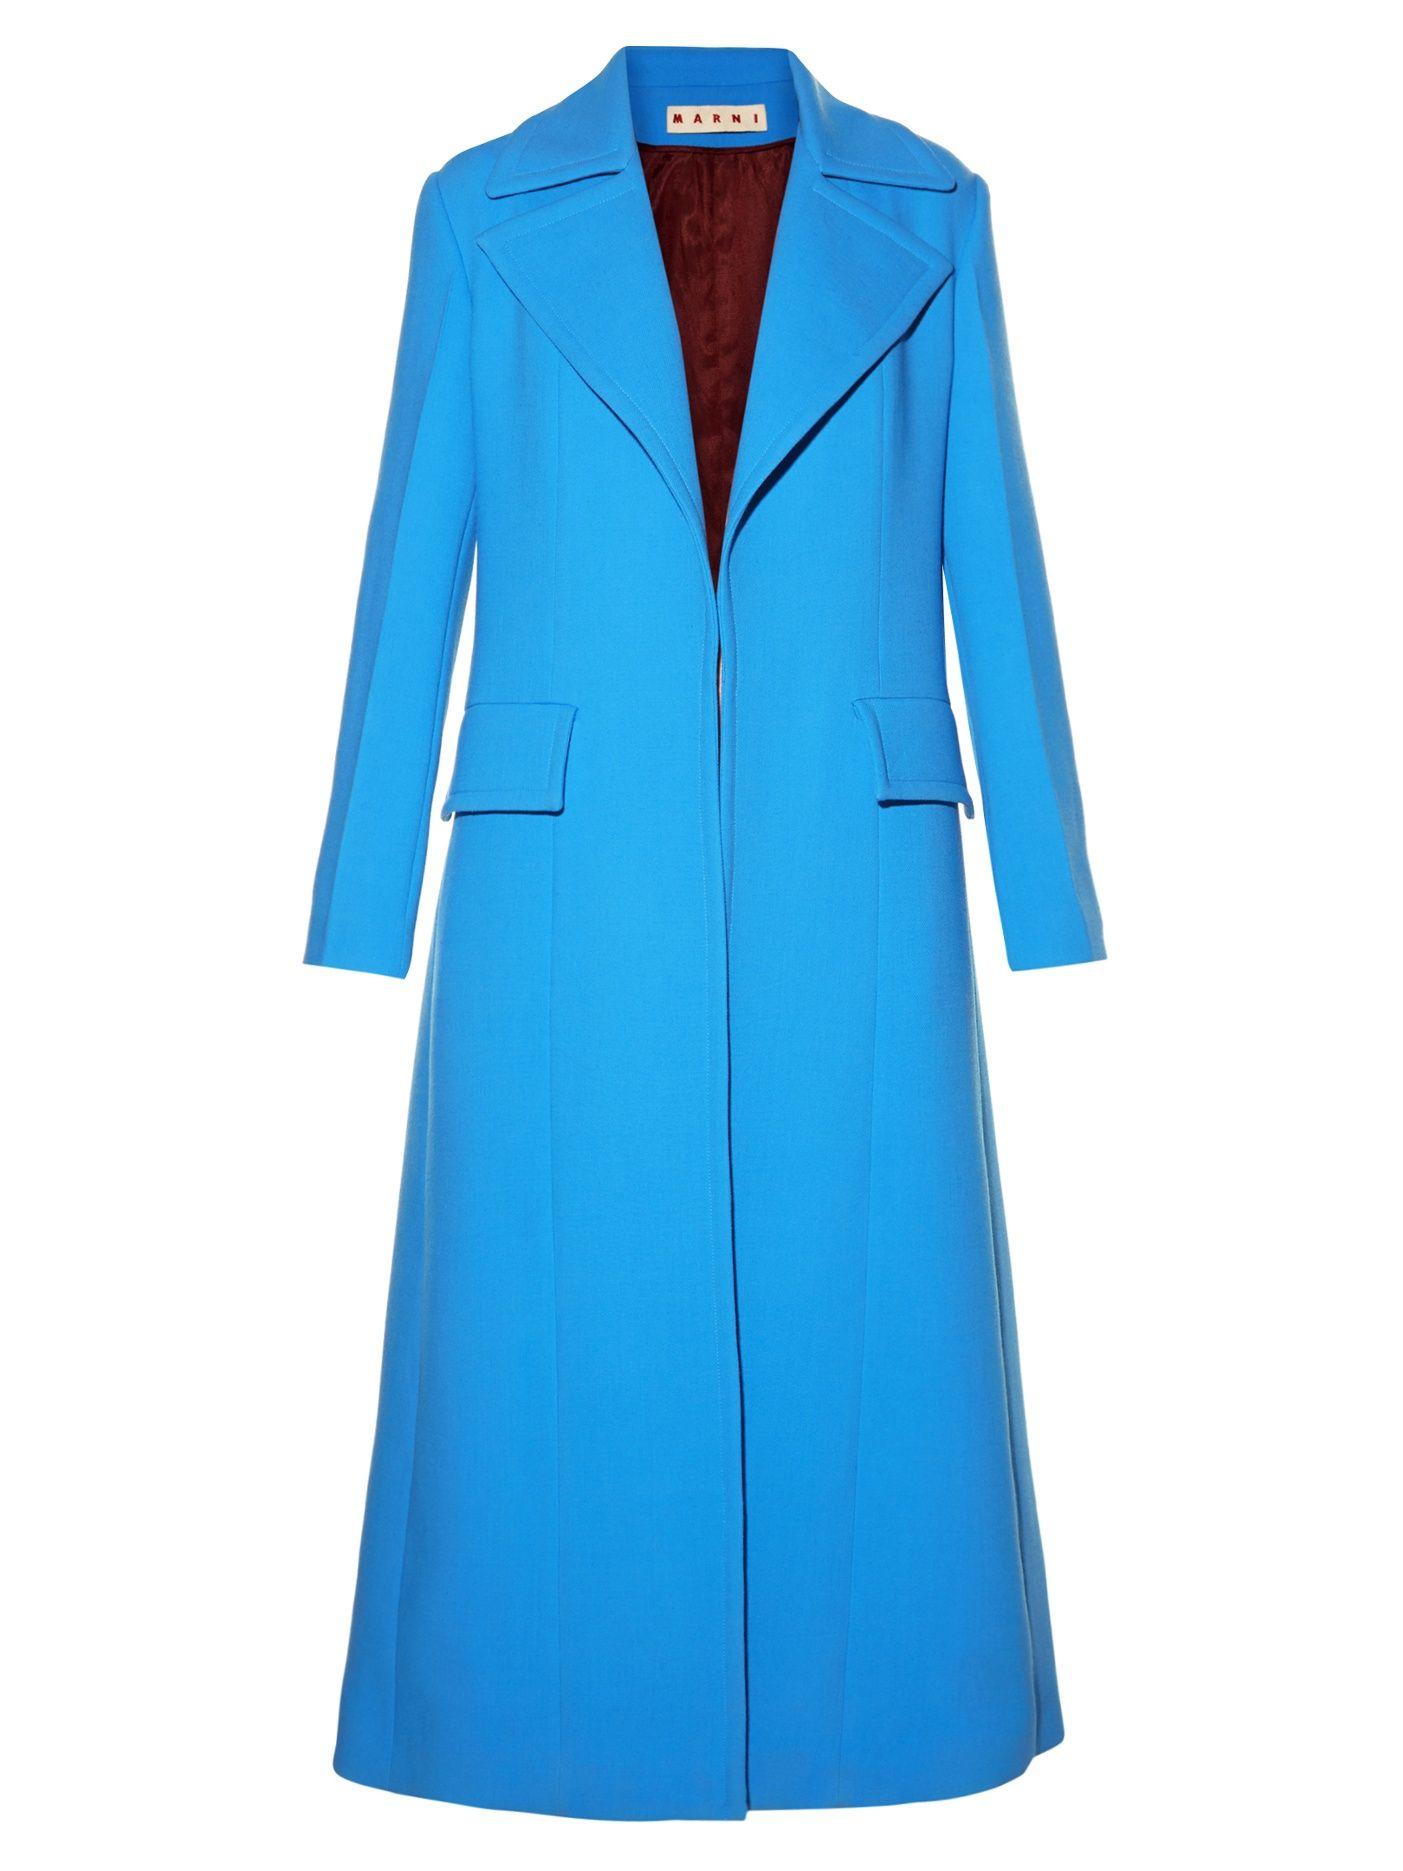 $1,998 Now$1,199 Save 40% Single-breasted long wool coat | Marni | MATCHESFASHION.COM US